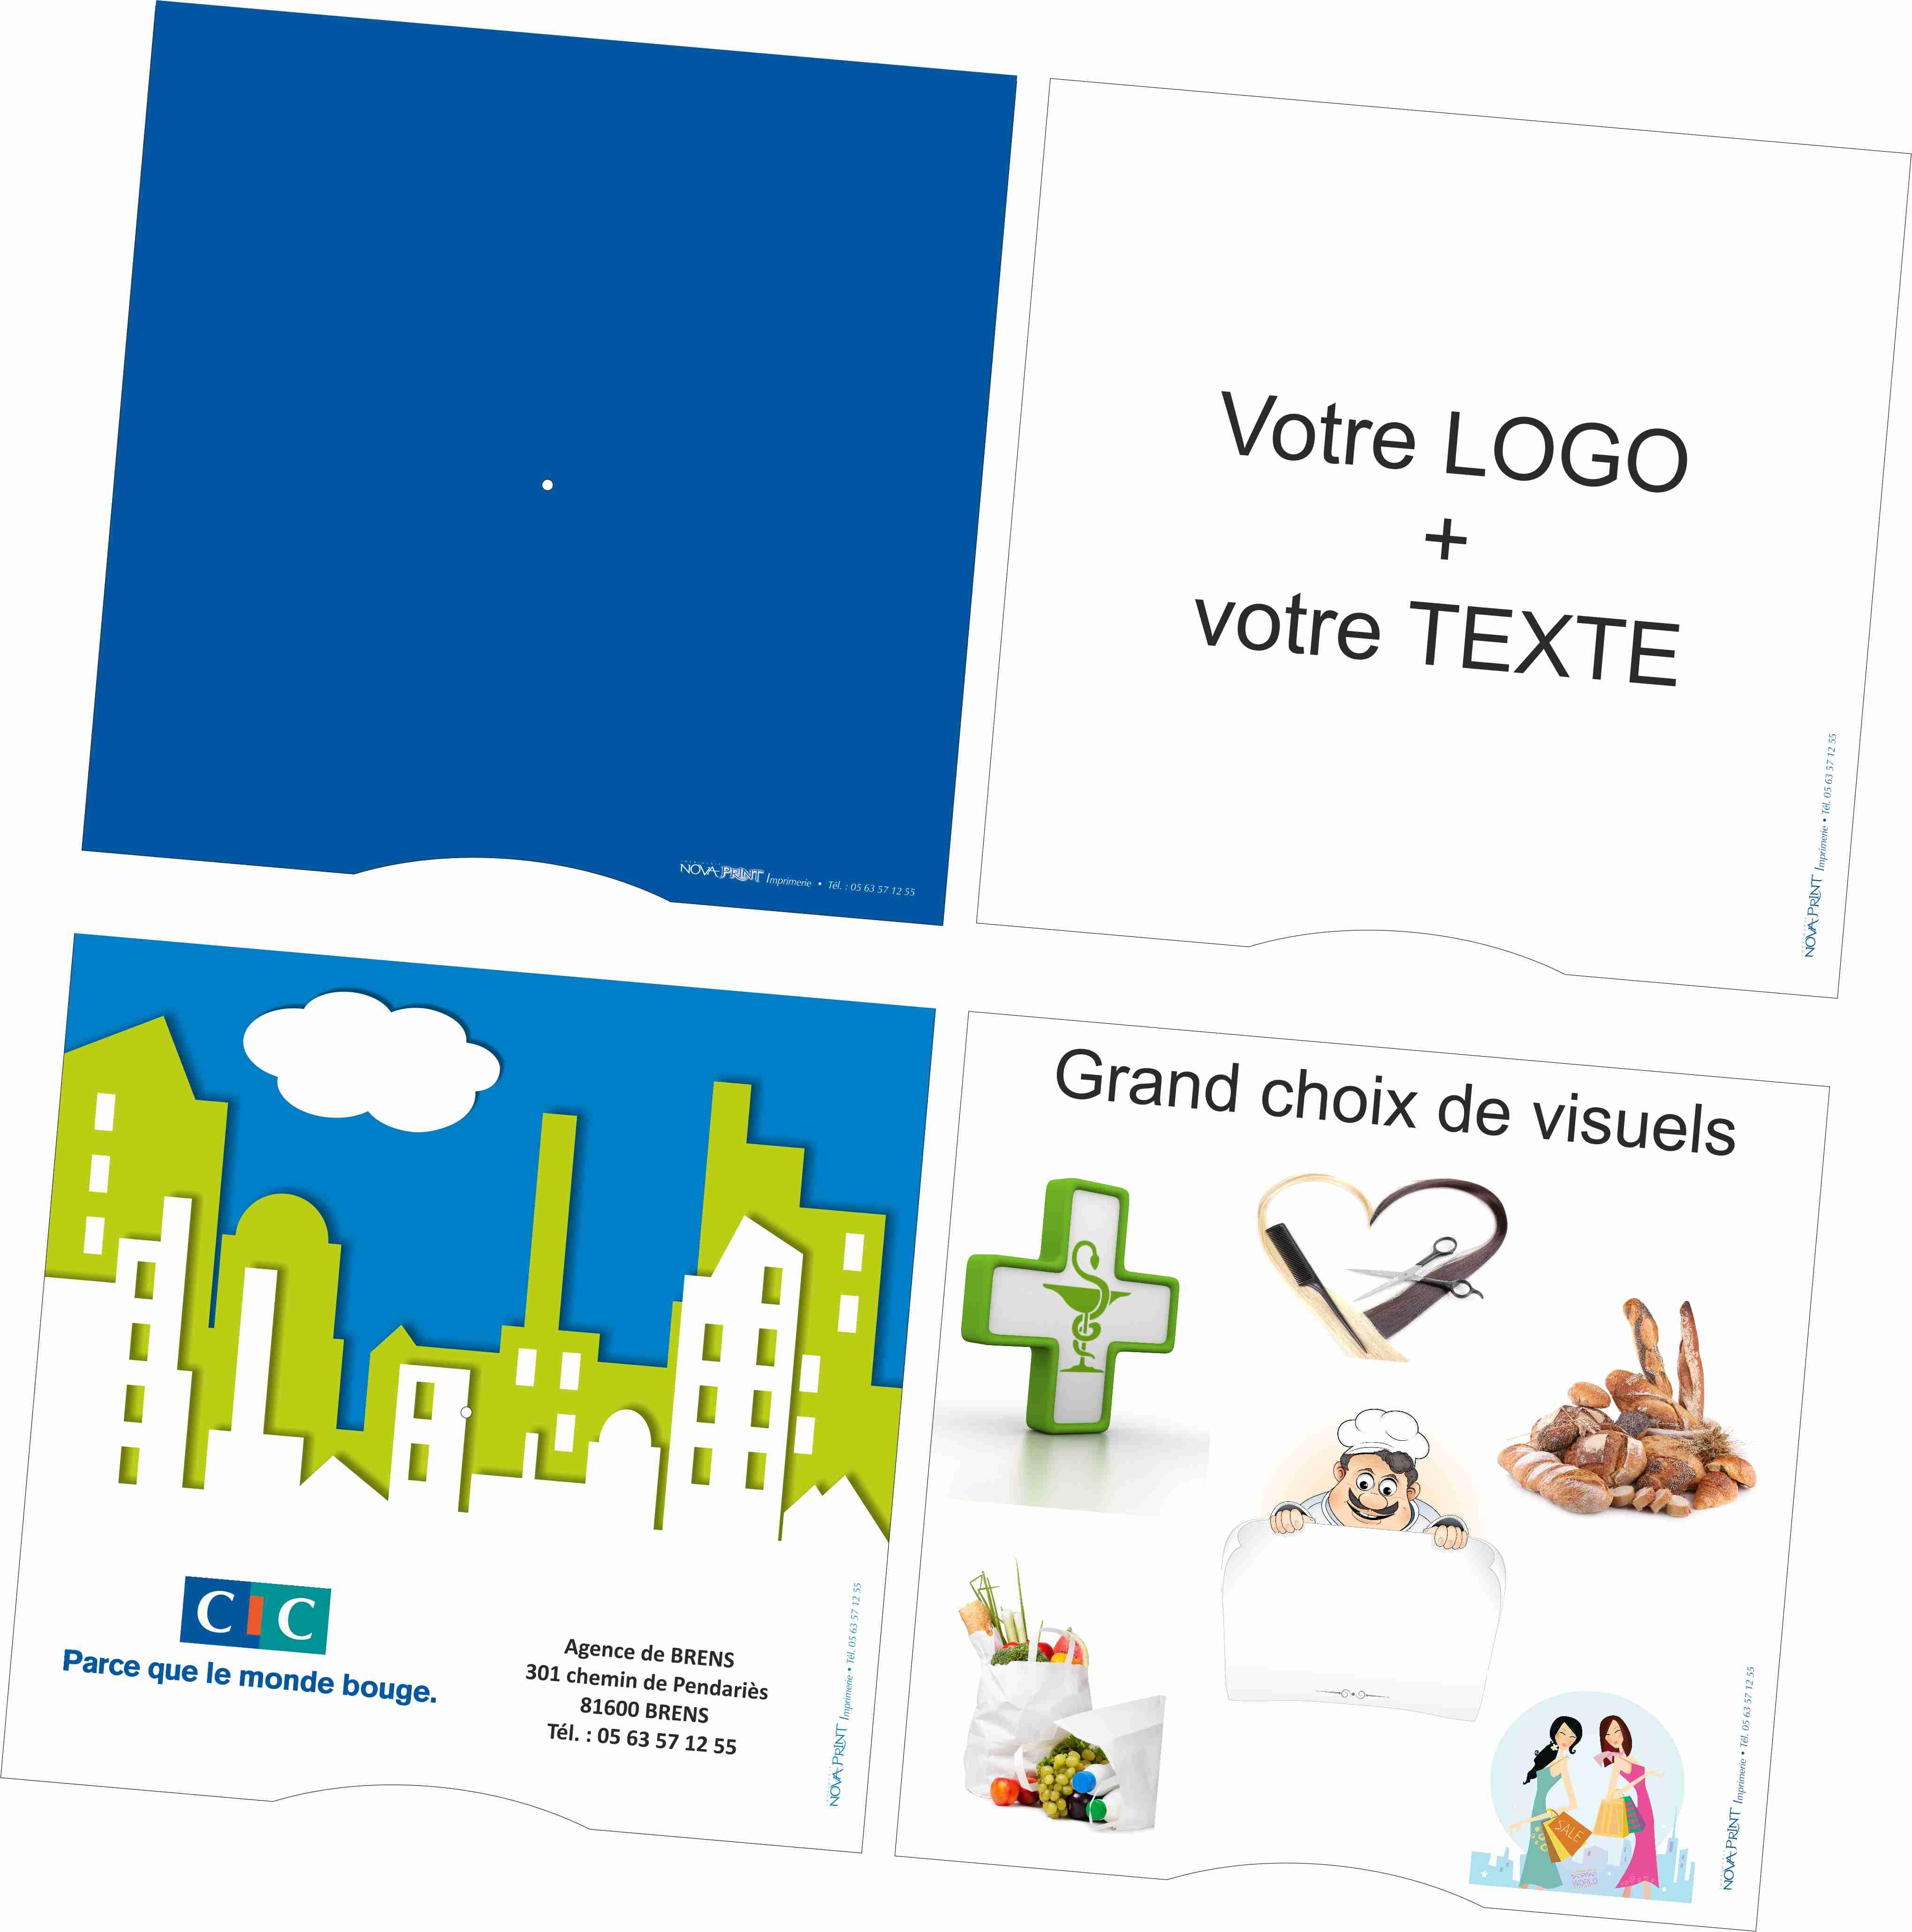 http://www.disquebleu.fr/medias/Image/amalgame%20disques%20france.jpg